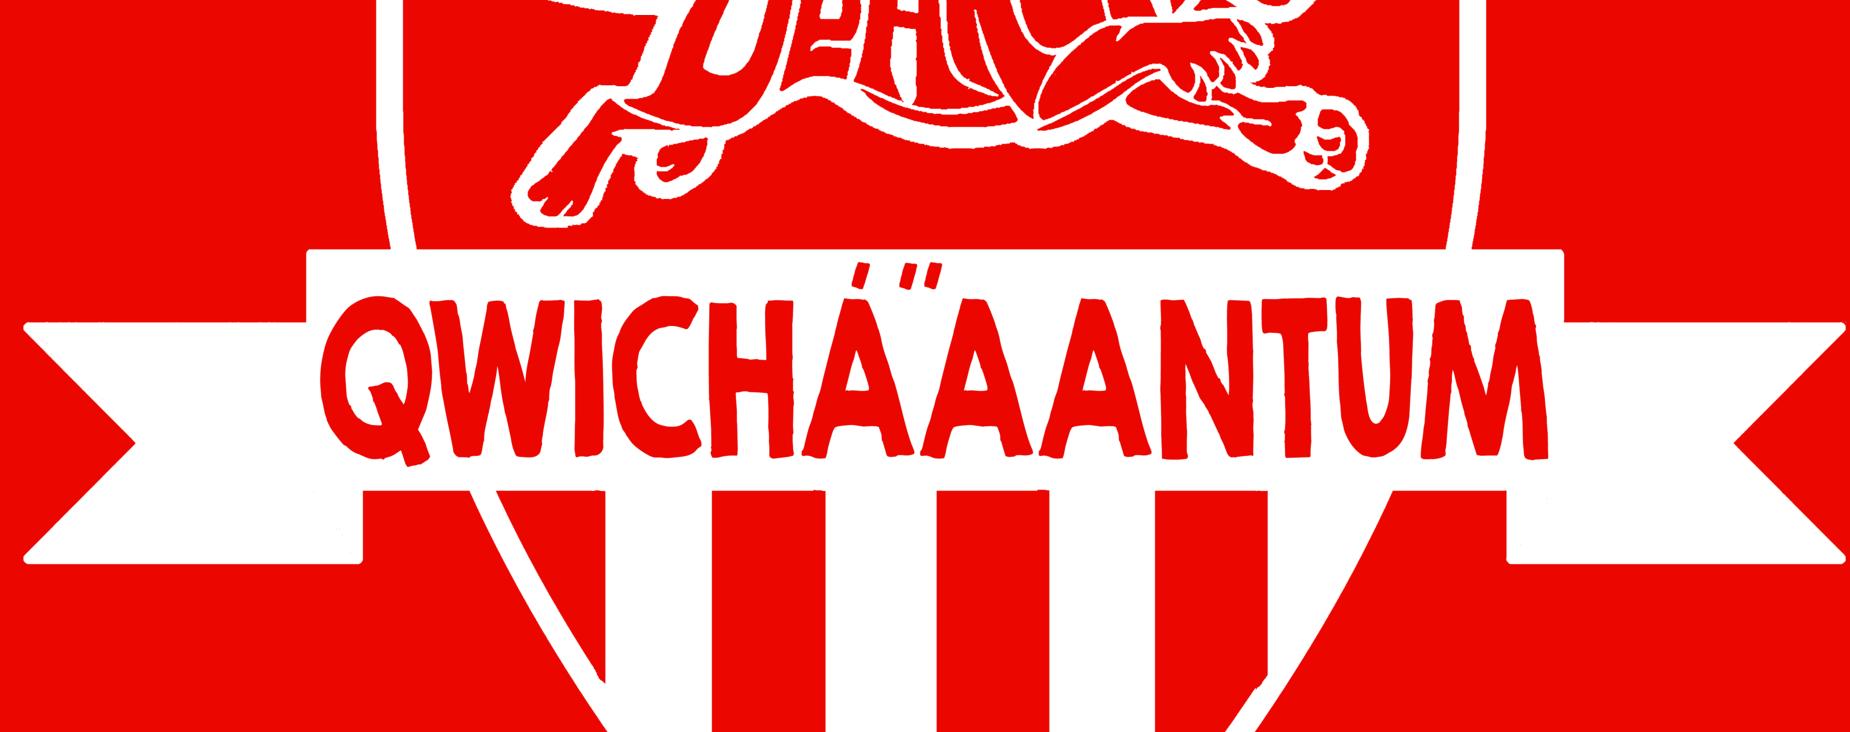 Qwichaaantum Logo